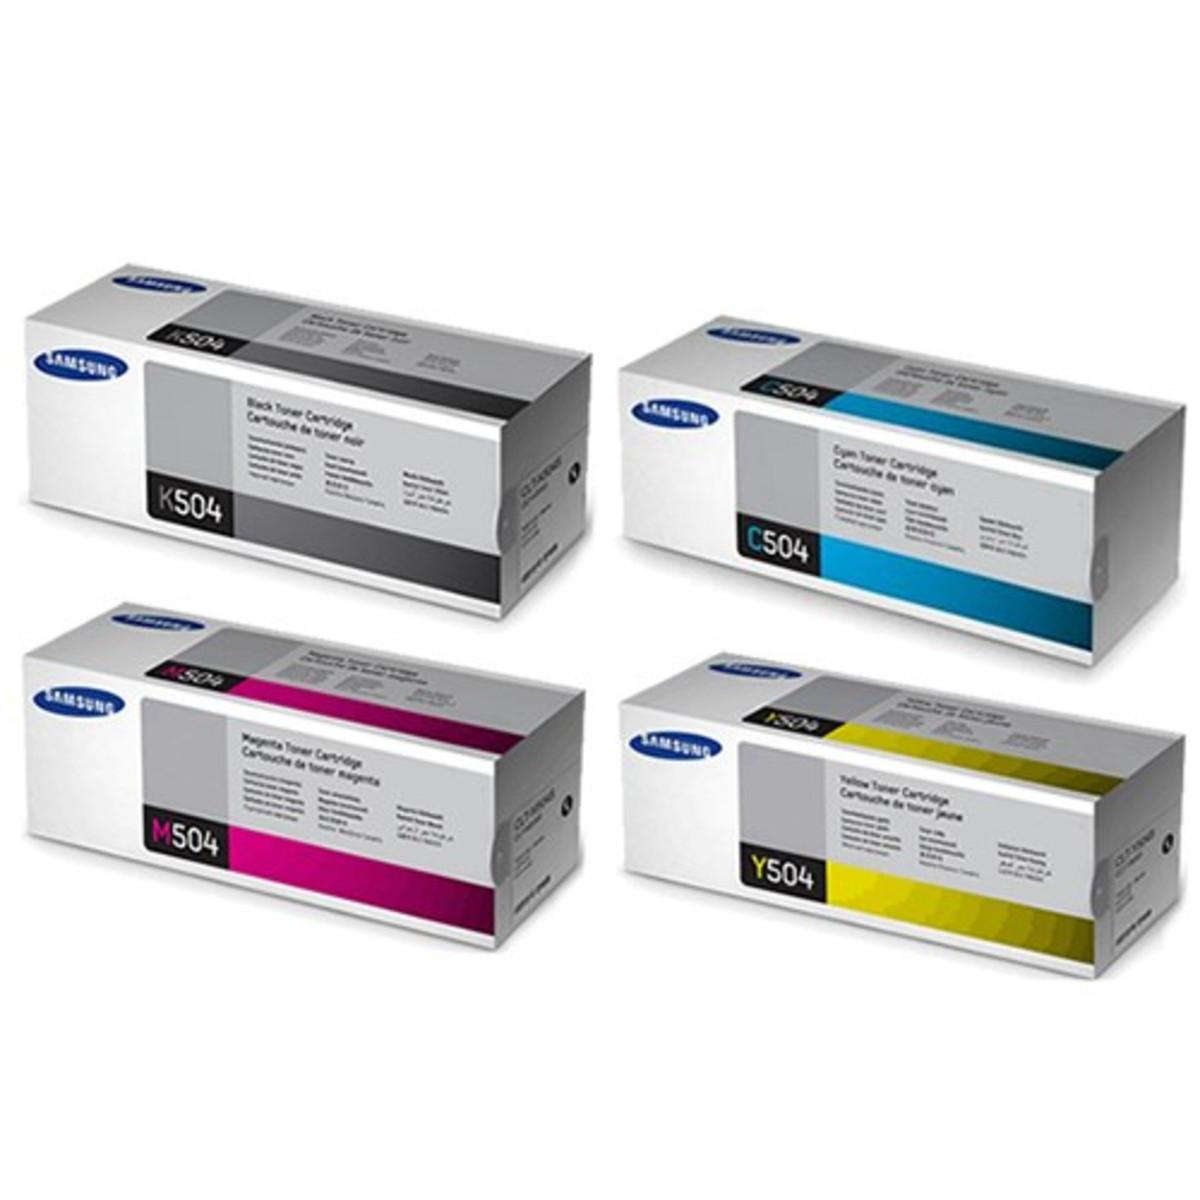 Samsung CLT-504 Bundle Pack